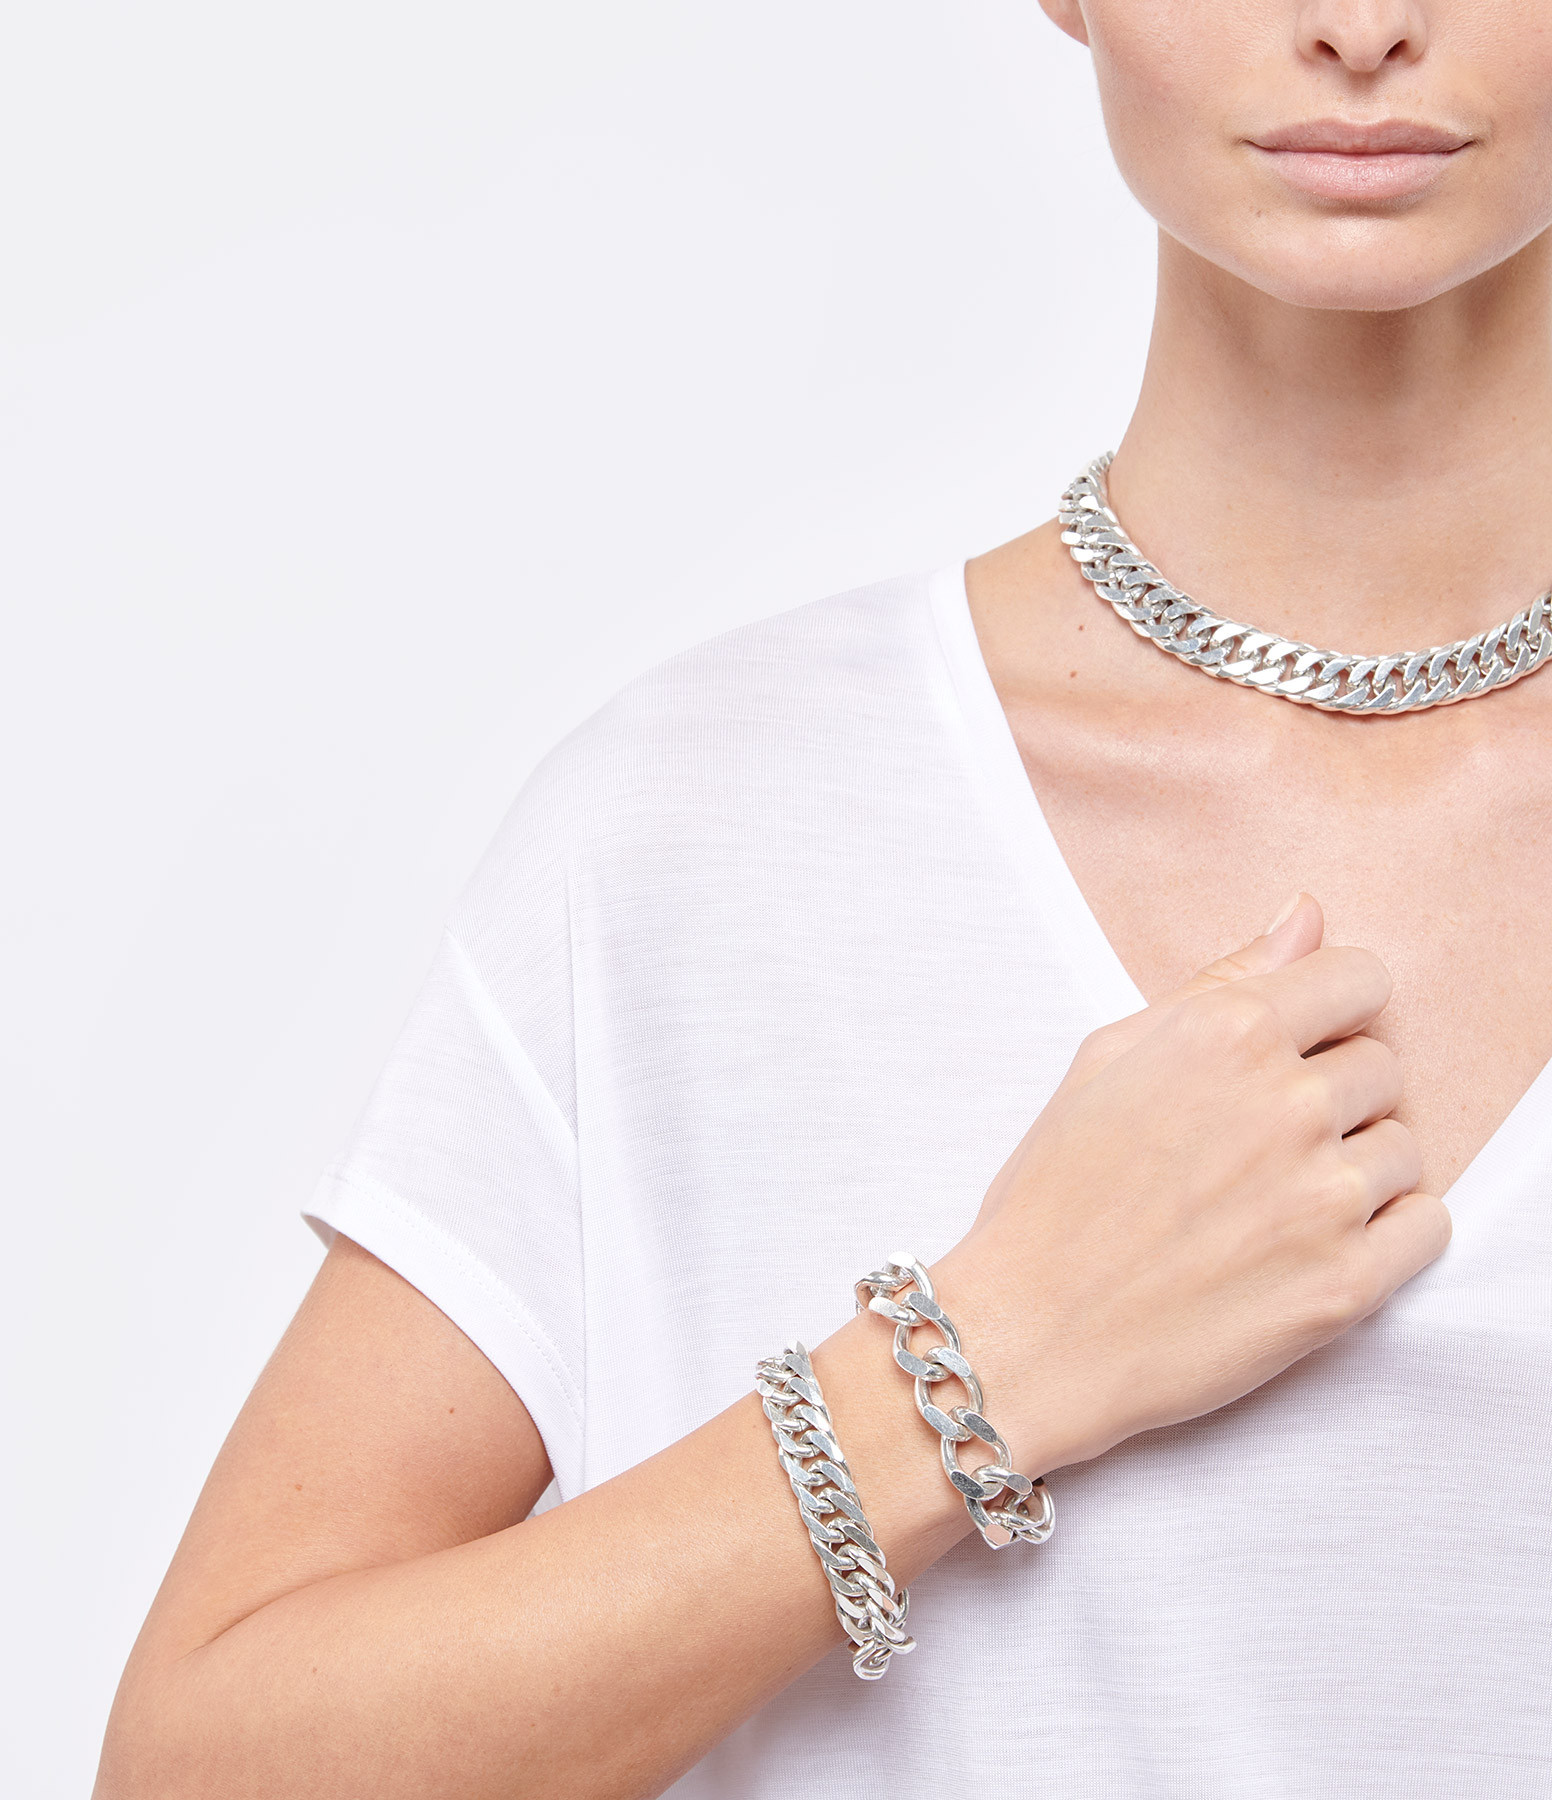 PERRINE TAVERNITI - Bracelet Amelot Argent